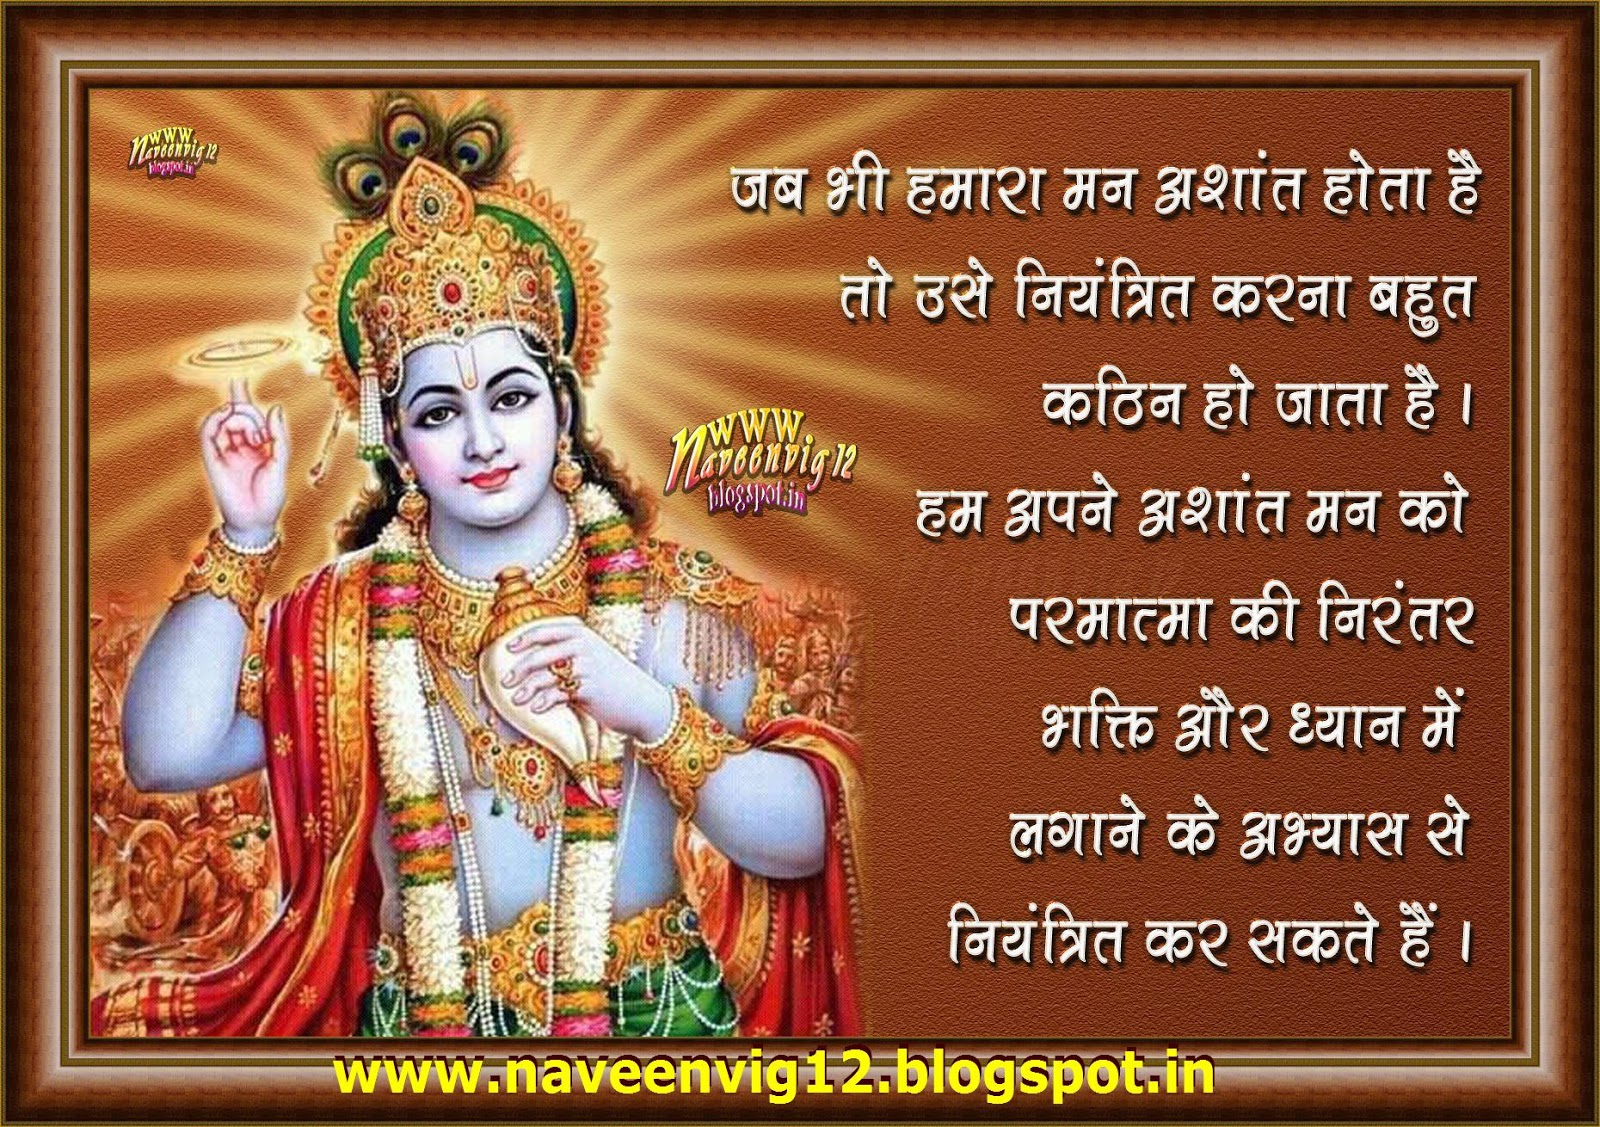 Jai Shri Krishna In Hindi Images 2018 For Happy Janmashtami God